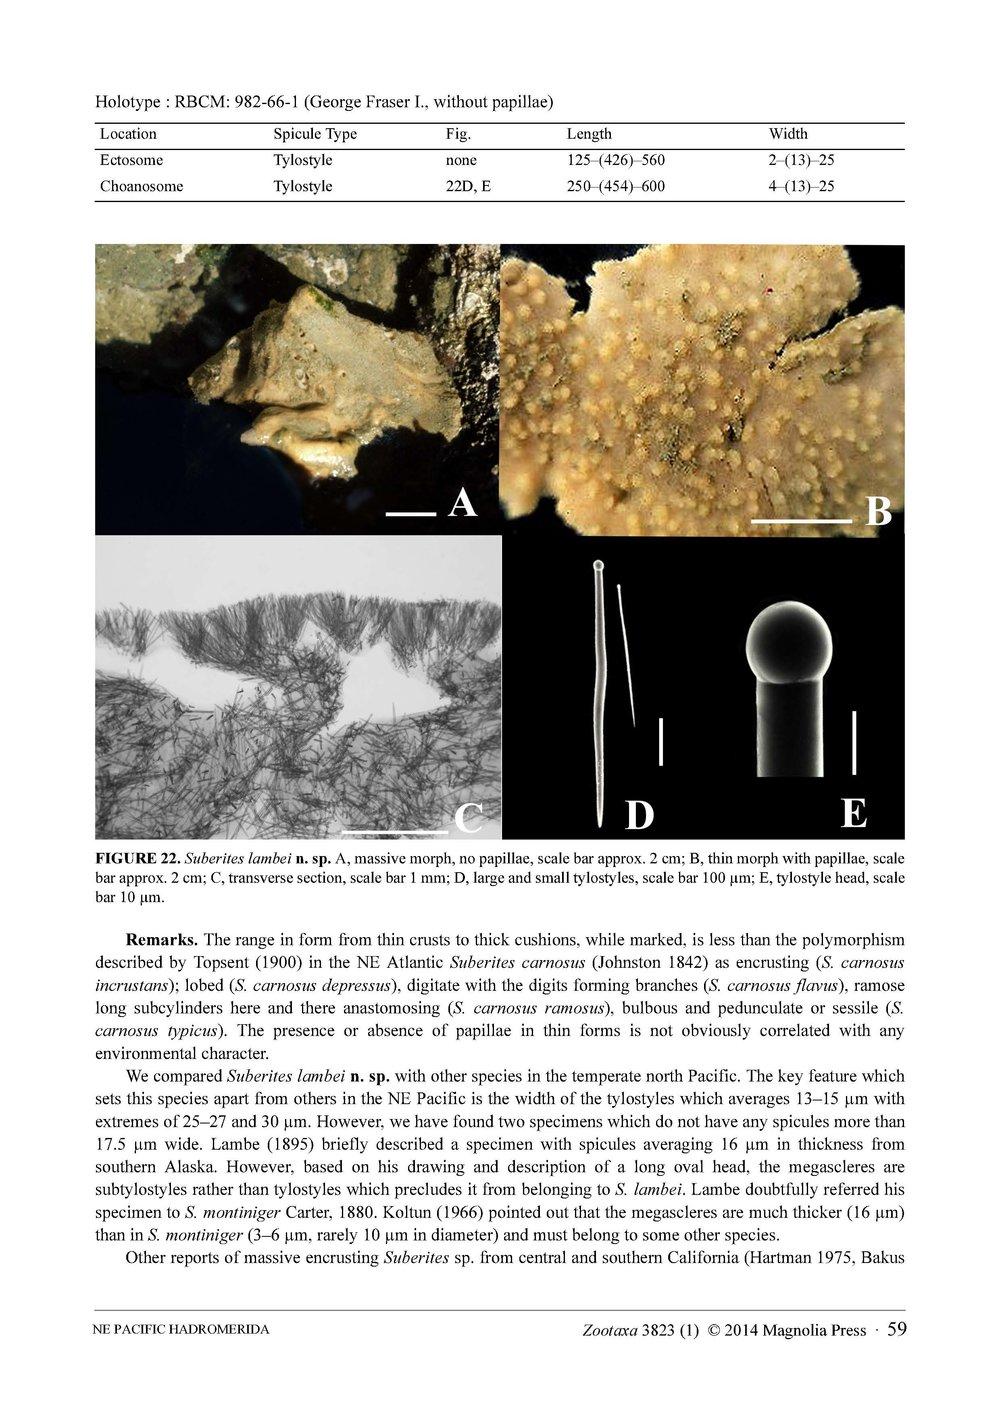 Austin et al 2014 NE Pacific Hadromerids_Page_59.jpg